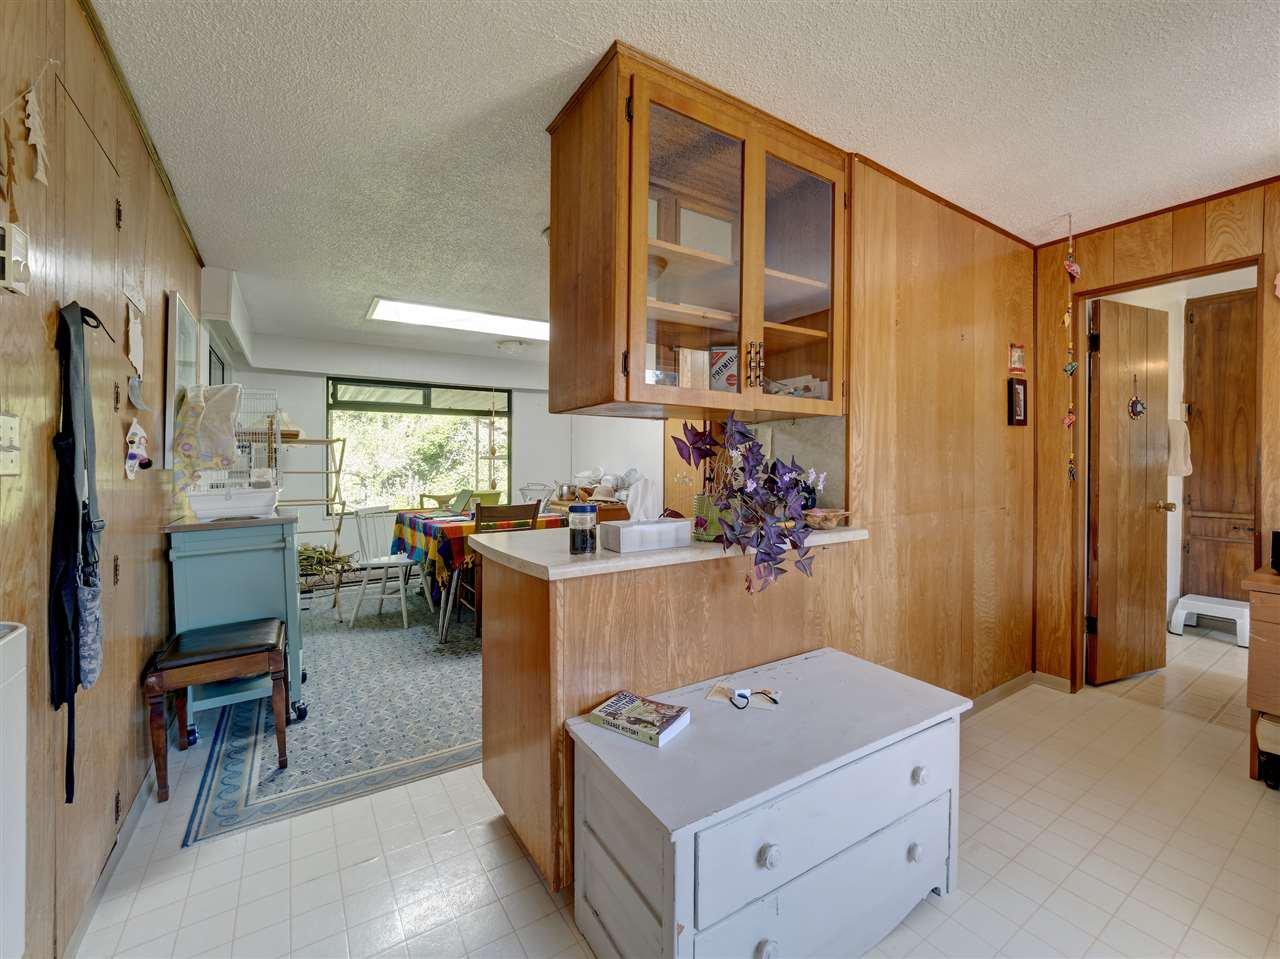 Photo 11: Photos: 5761 MCLAUGHAN Road in Sechelt: Sechelt District House for sale (Sunshine Coast)  : MLS®# R2479077